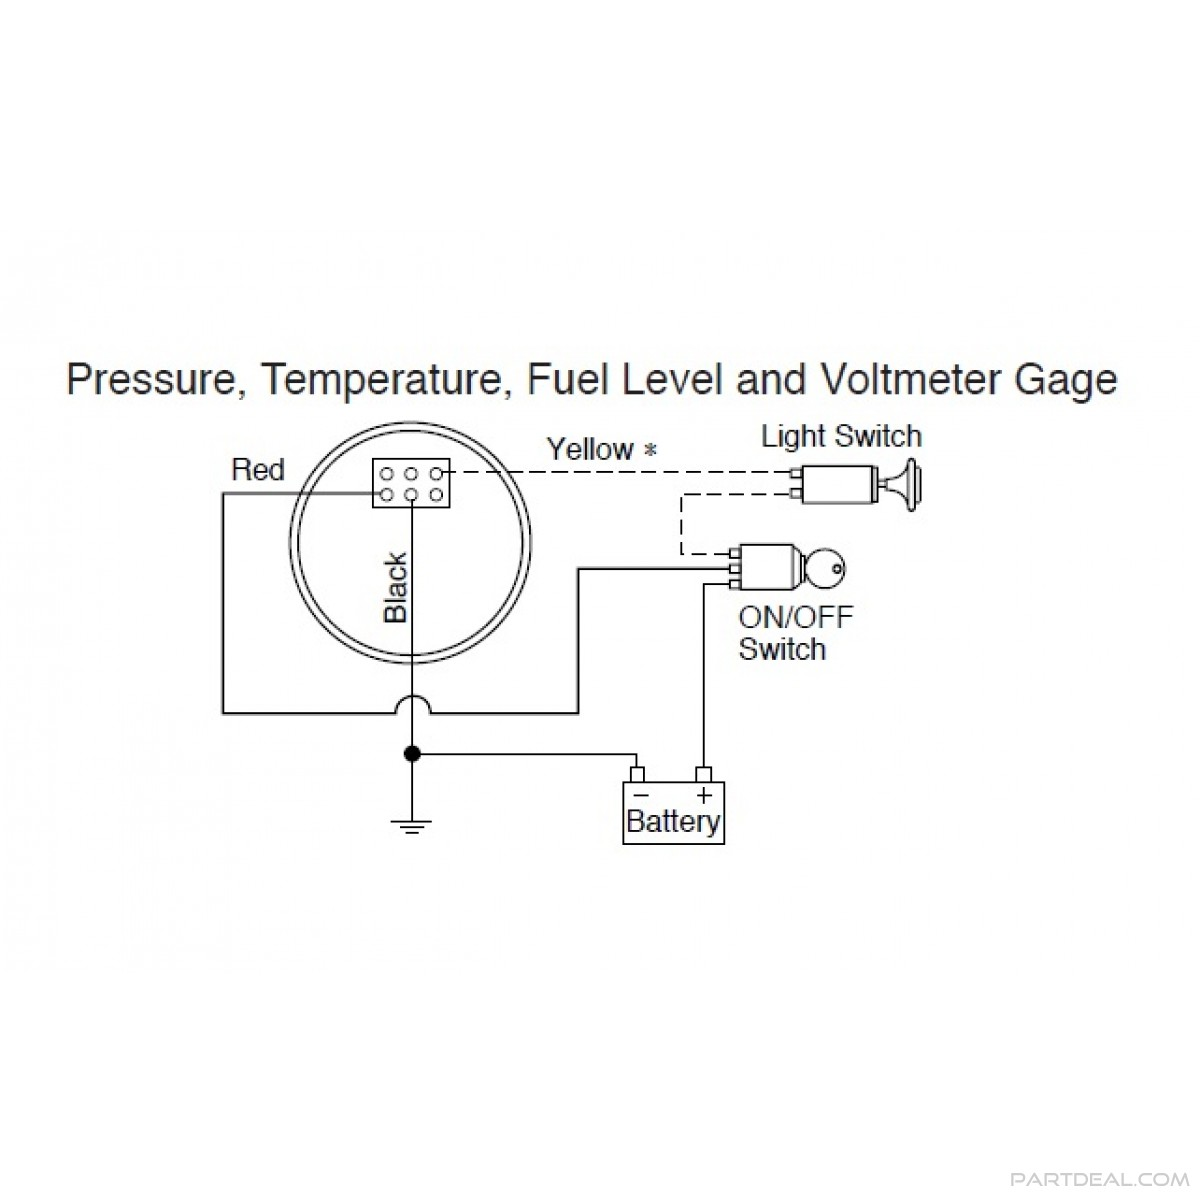 Chevrolet Volt Gauge Wiring Diagram - Wiring Diagram And grain-reader -  grain-reader.worldwideitaly.it | Chevrolet Volt Gauge Wiring Diagram |  | grain-reader.worldwideitaly.it